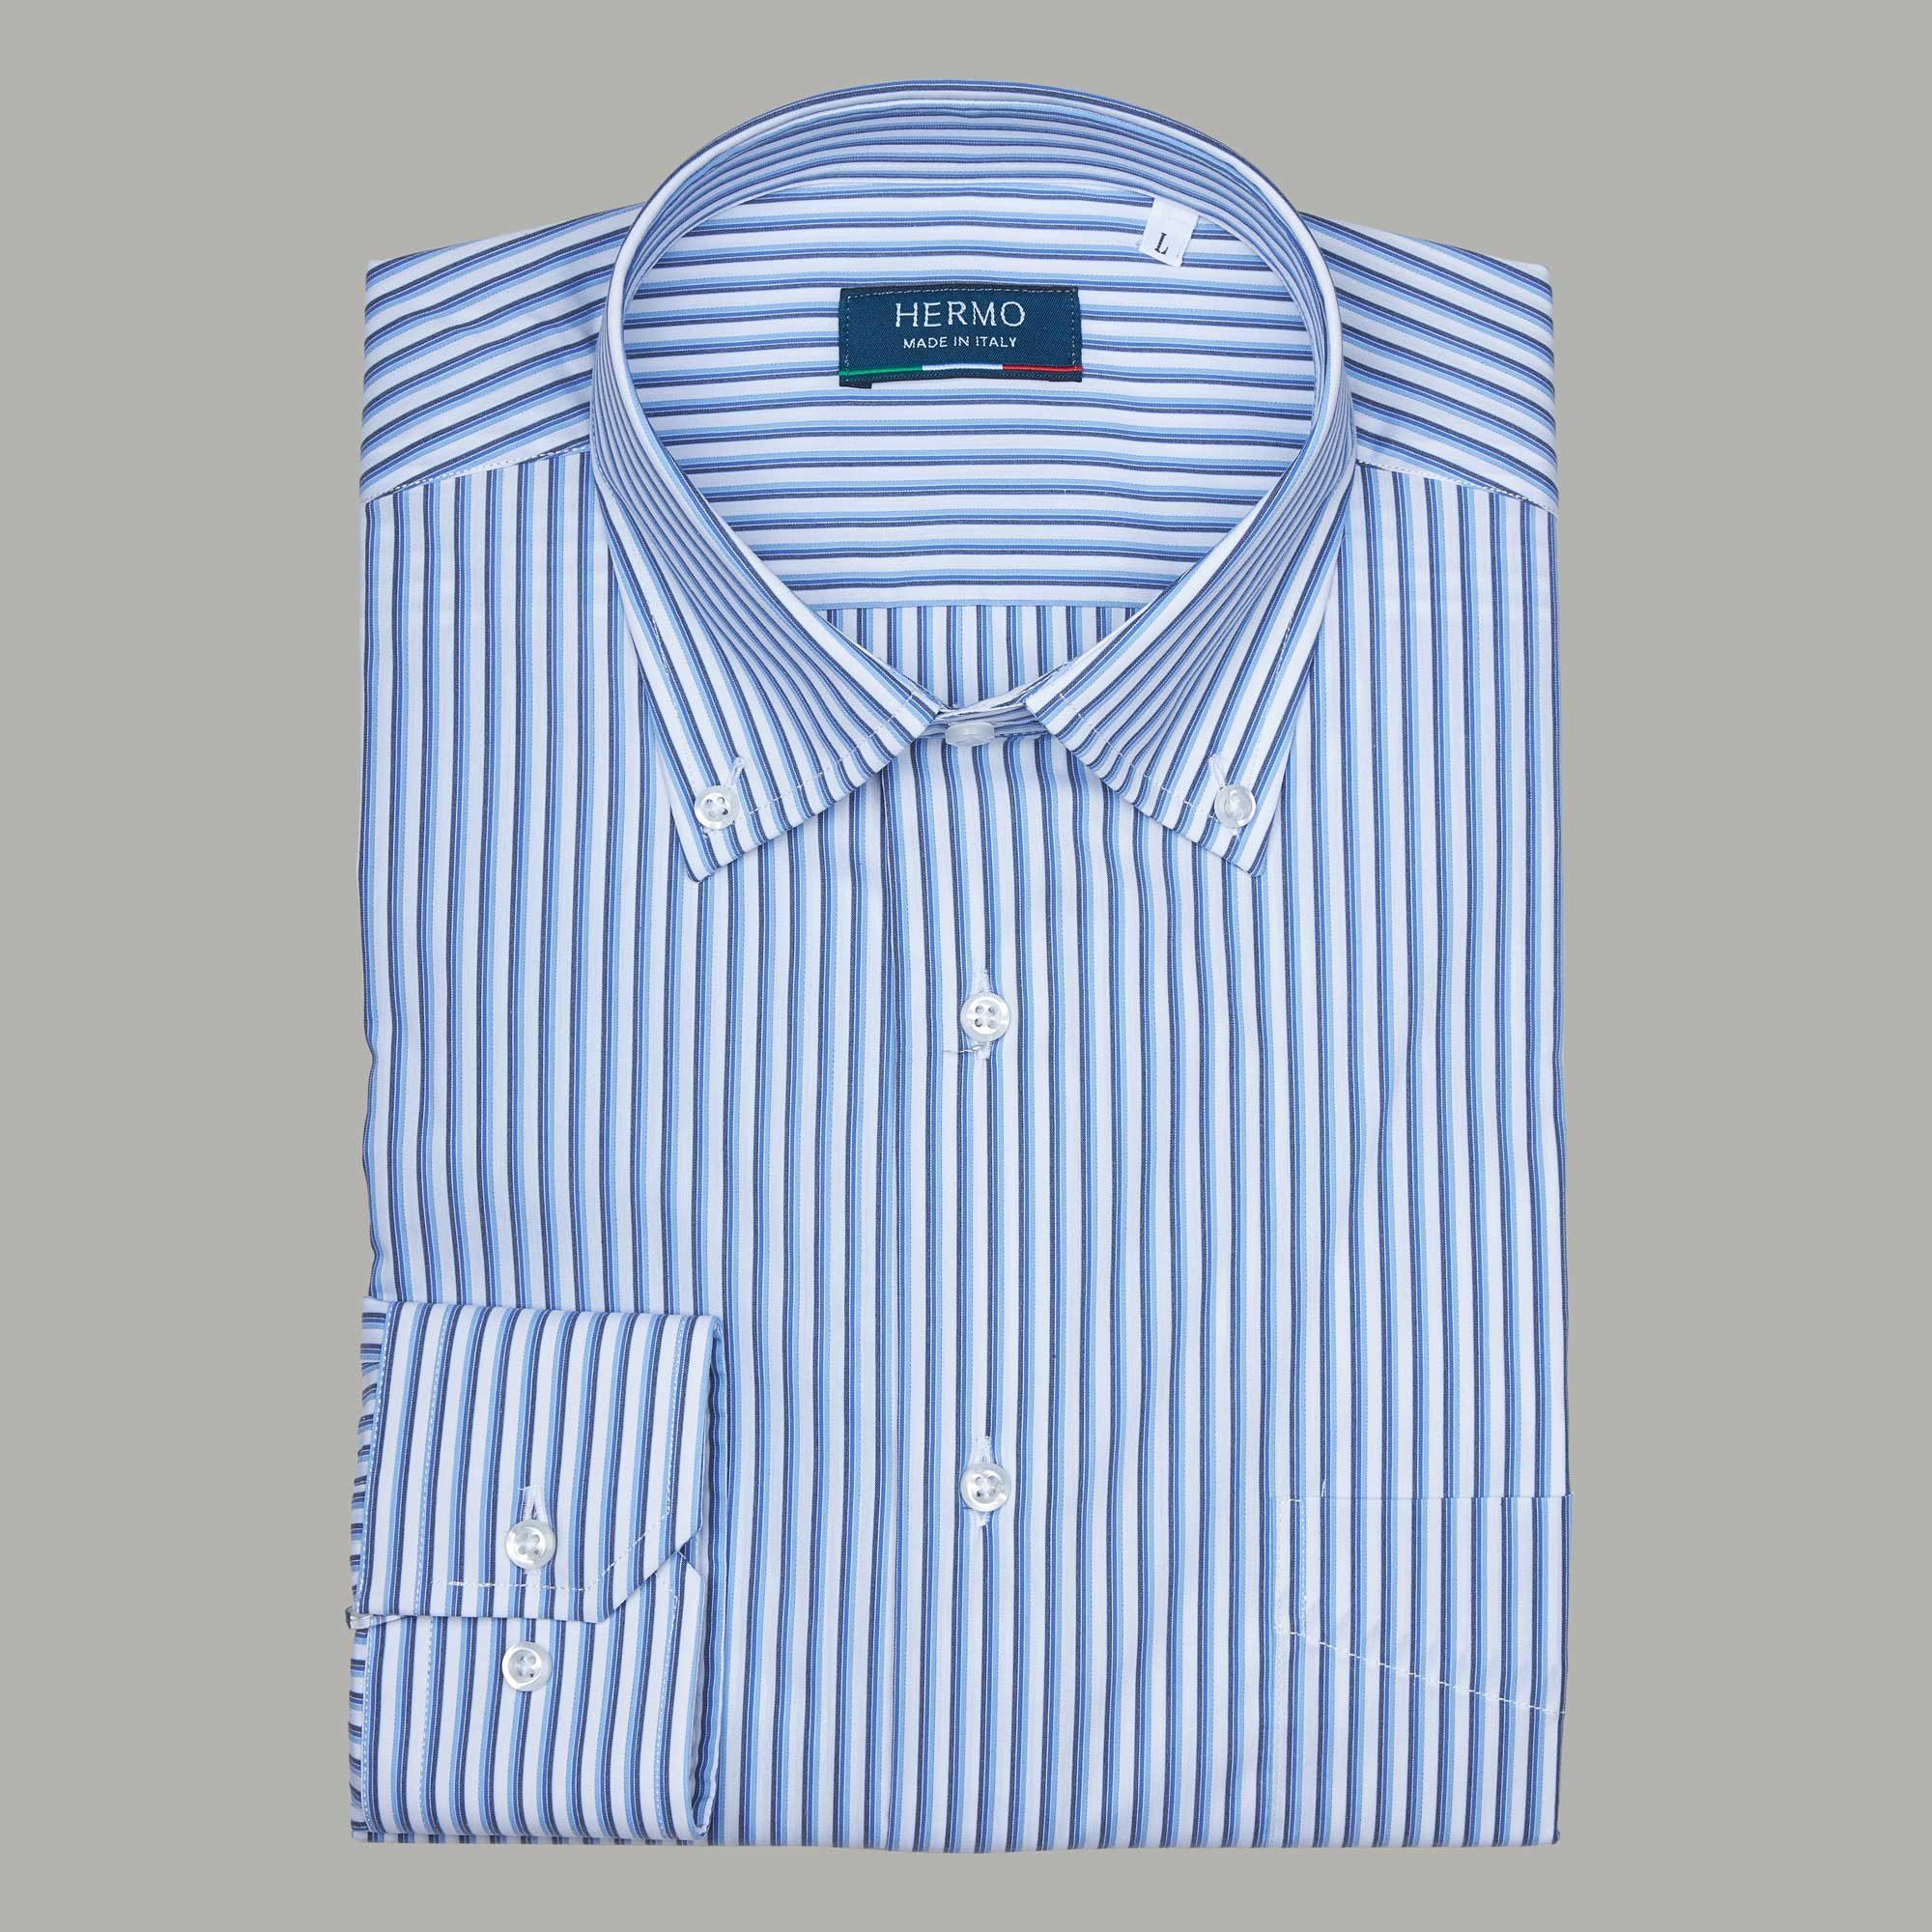 Camicia da uomo a righe blu